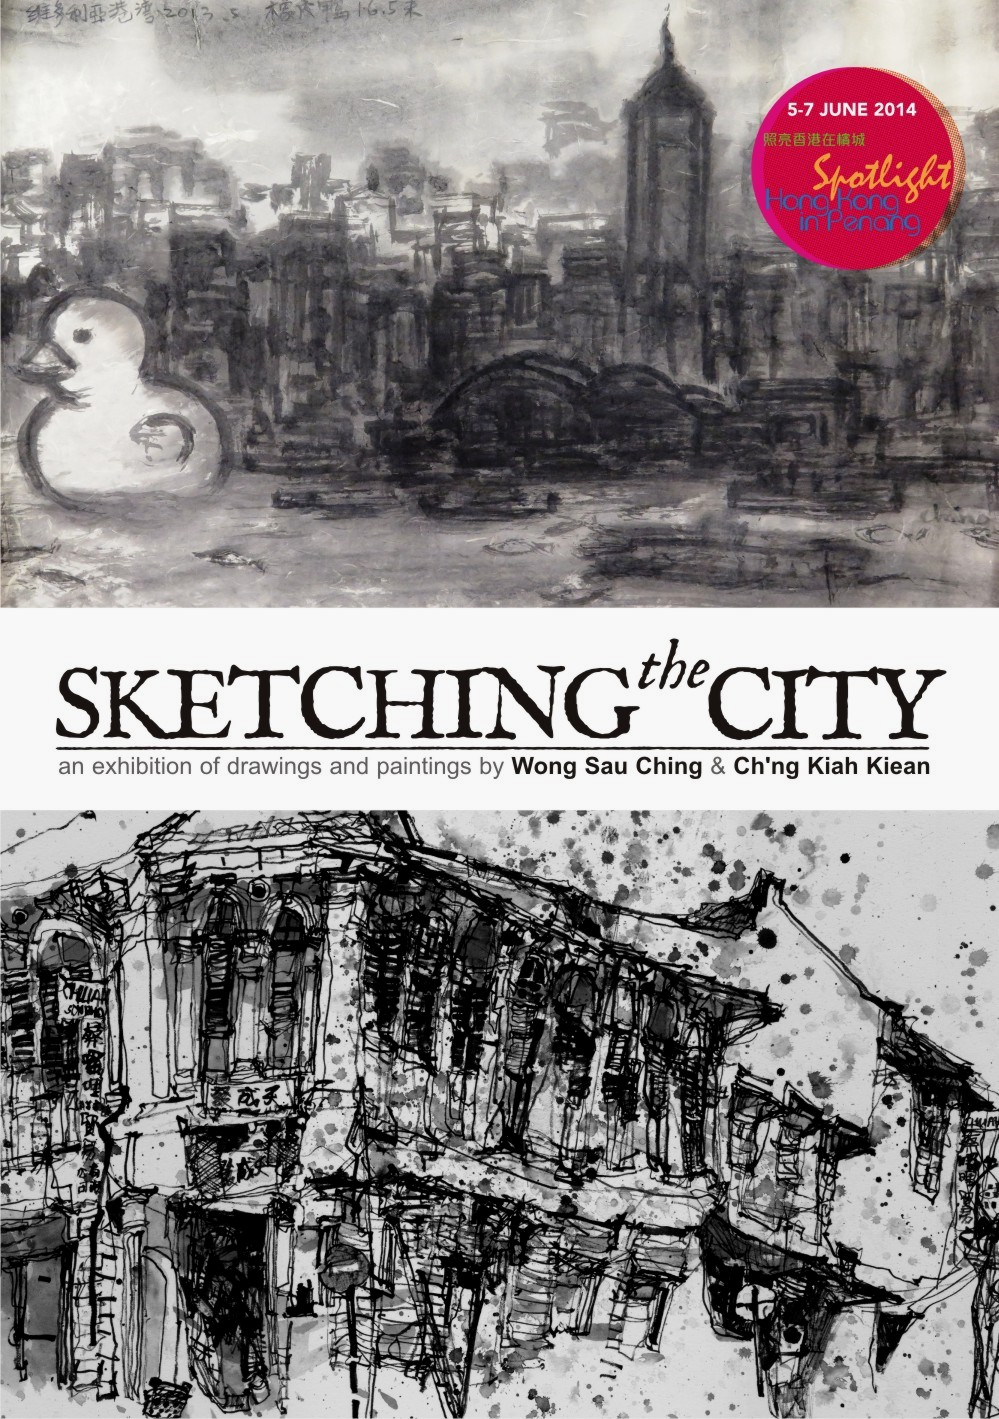 SpHK2014_Sketching the City_Invitation Card_01